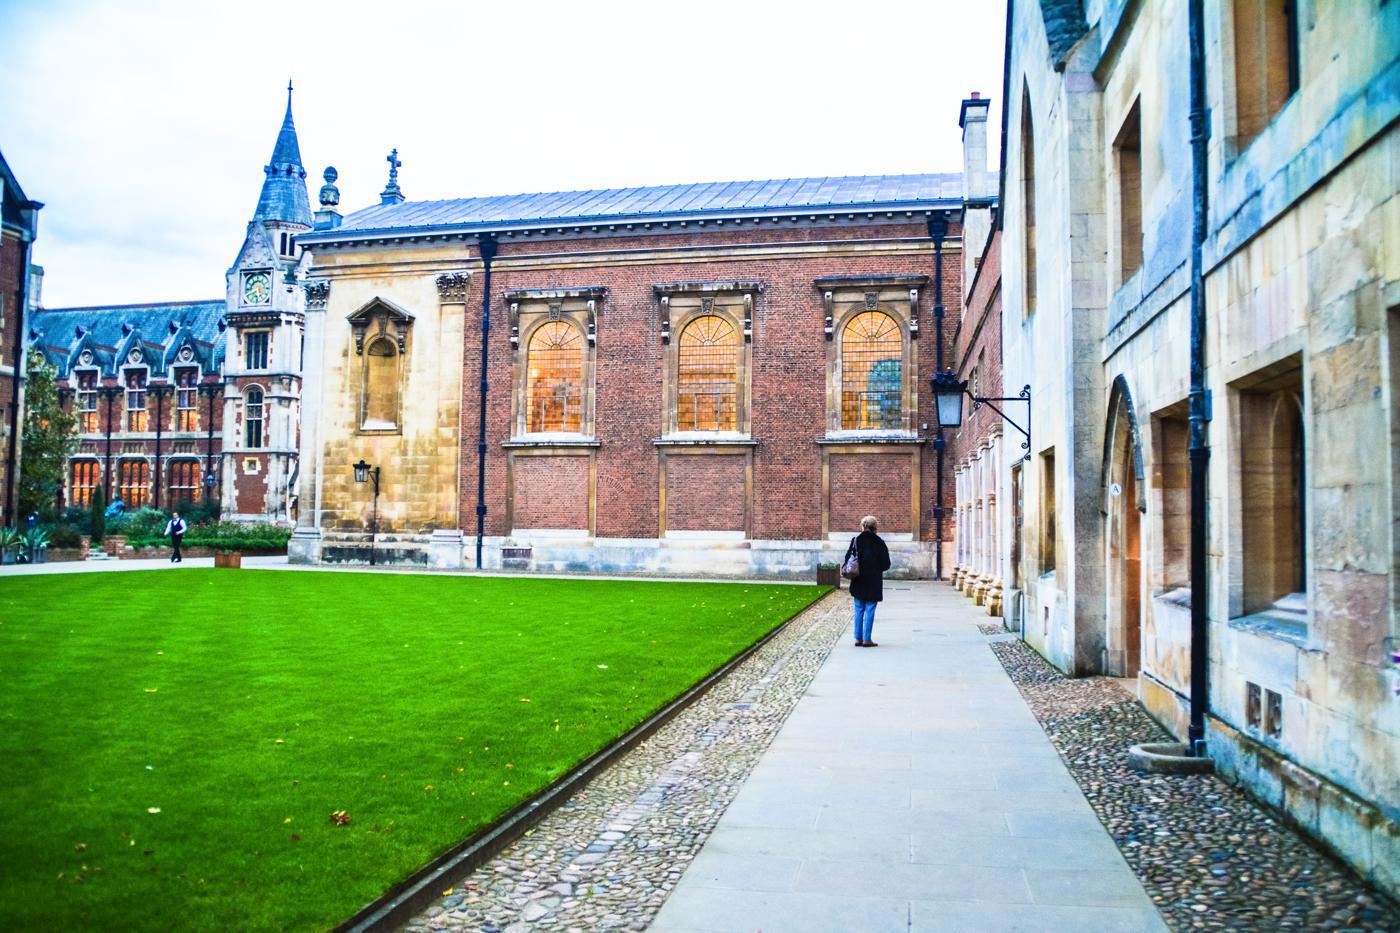 The University of Cambridge, Graduation, Senate House, Cambridge, England (1)